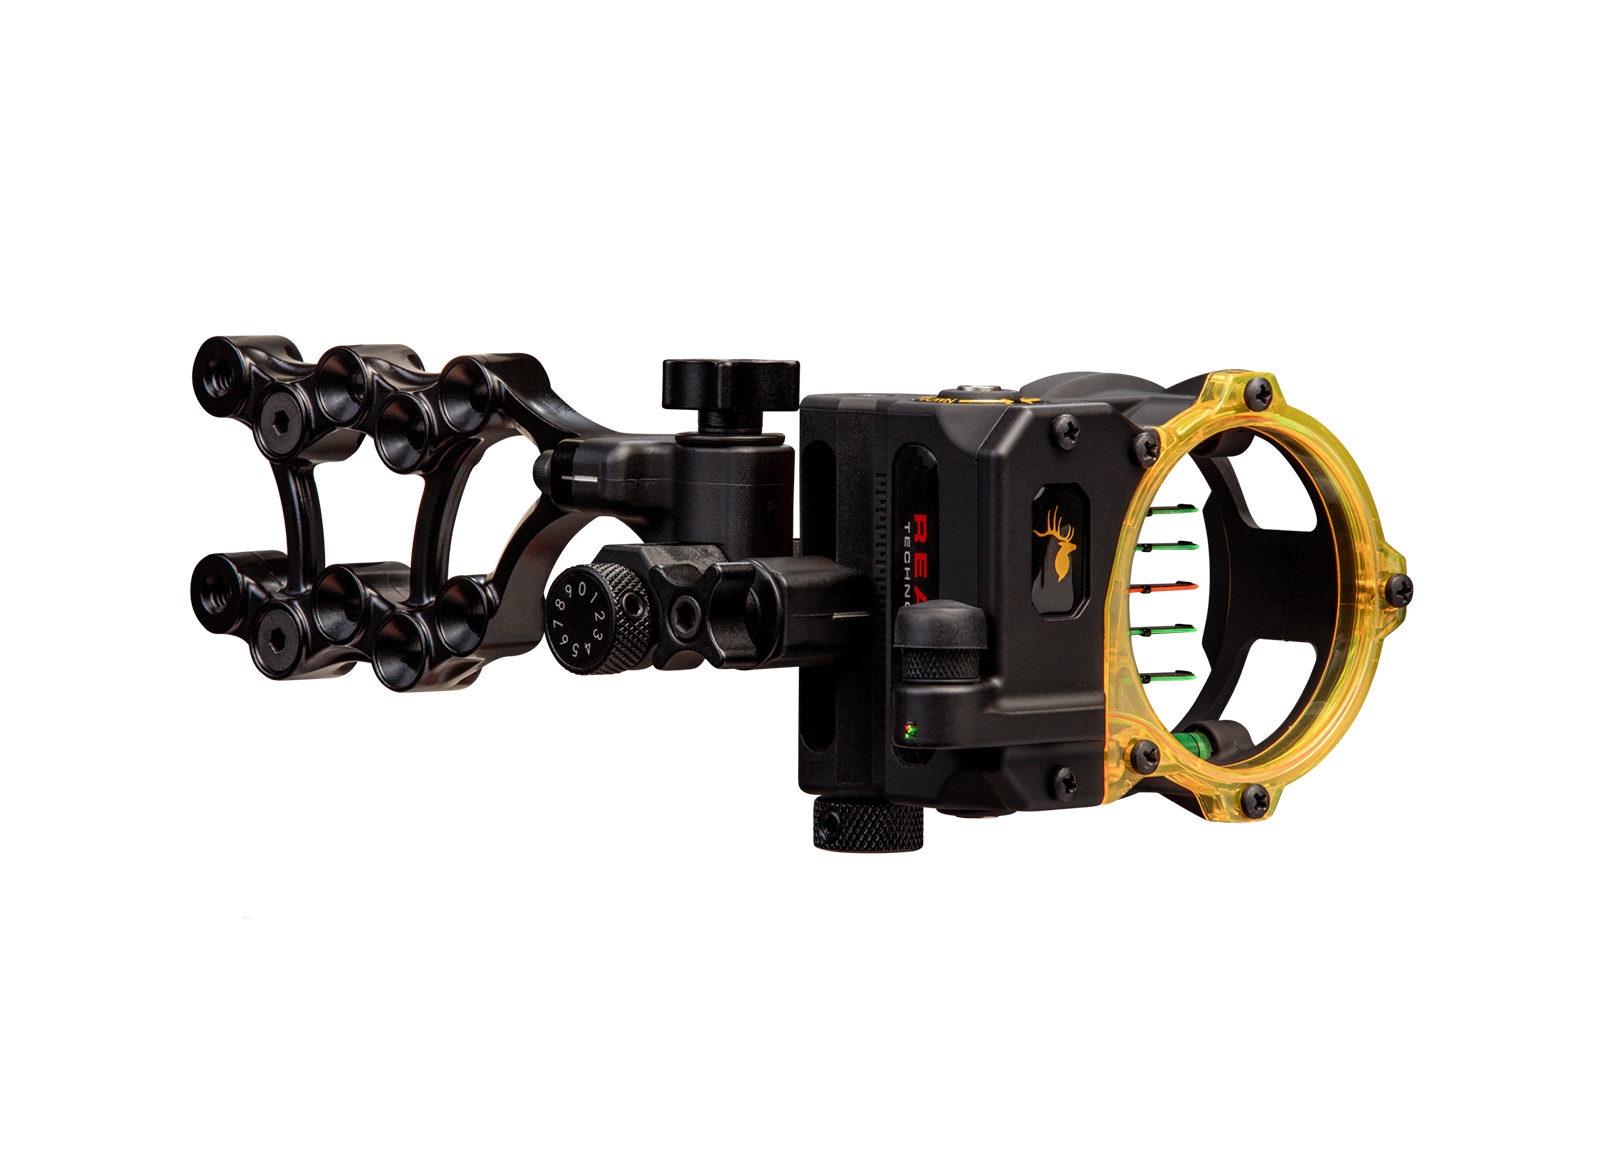 TROPHY RIDGE MIRINO COMPOUND 3D RETALIATE 5 PIN 0.019'' RH